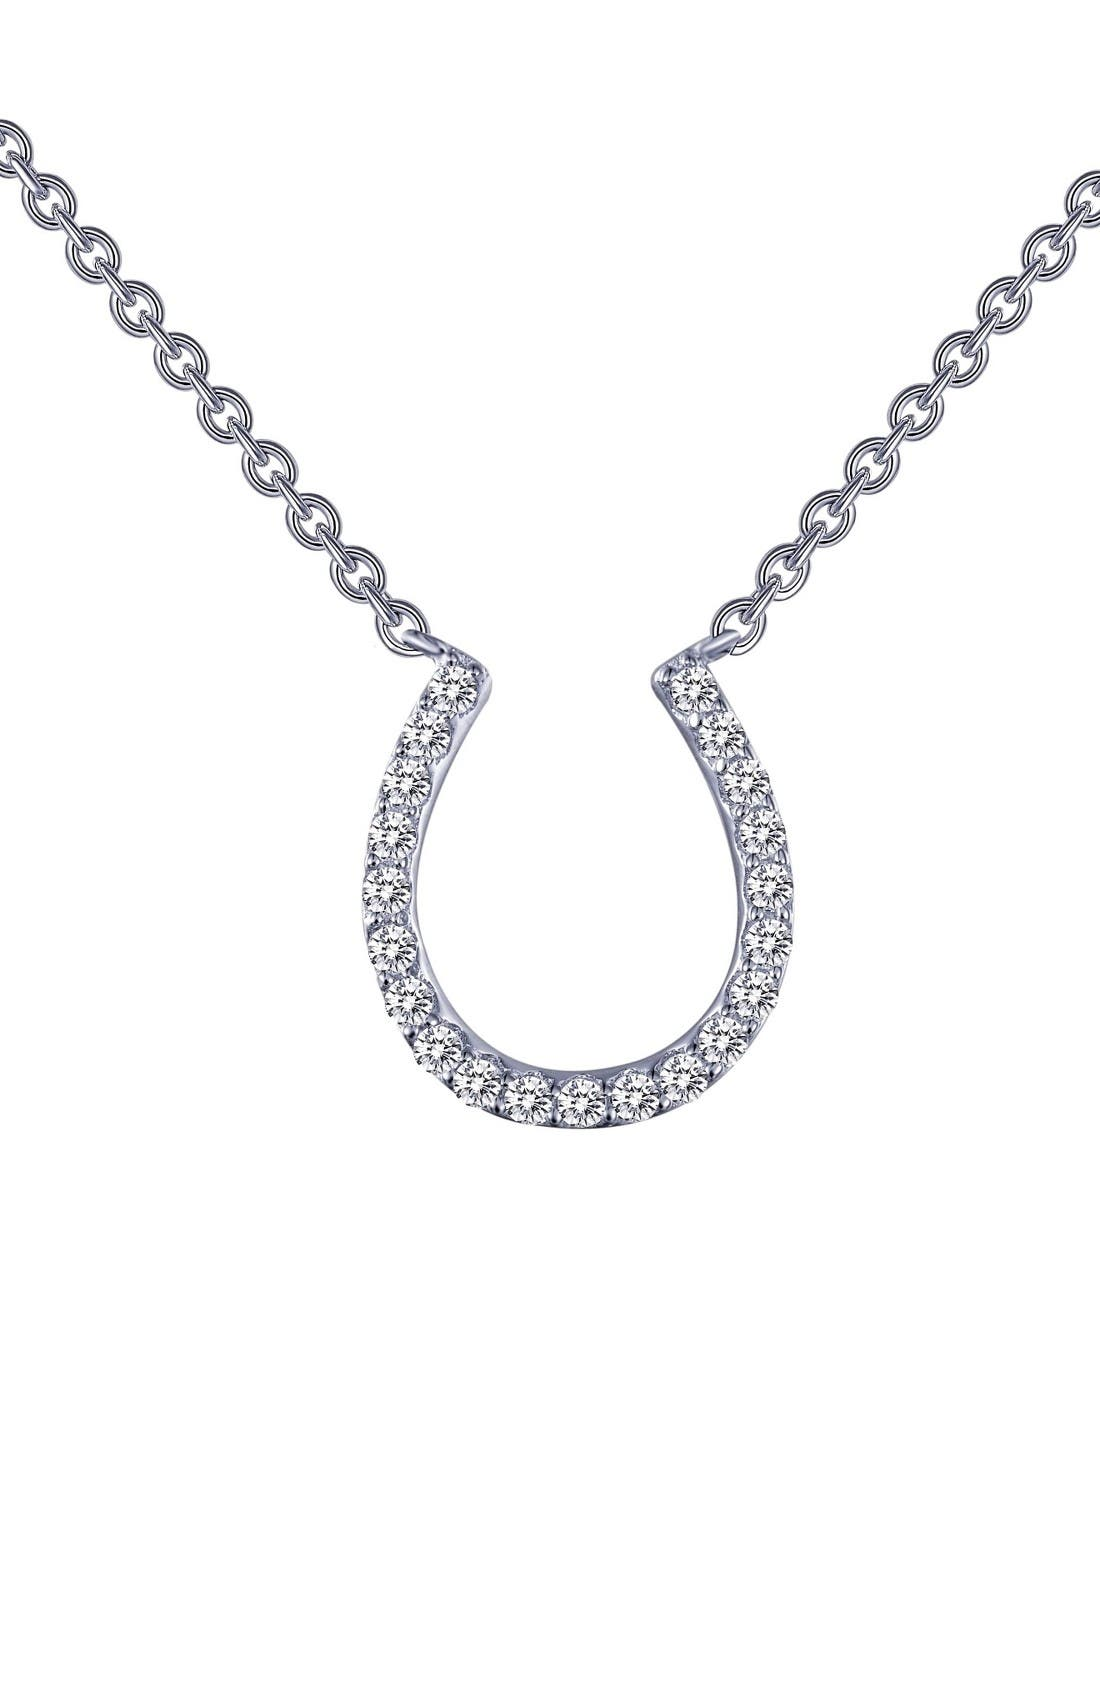 Main Image - Lafonn Horseshoe Simulated Diamond Pendant Necklace